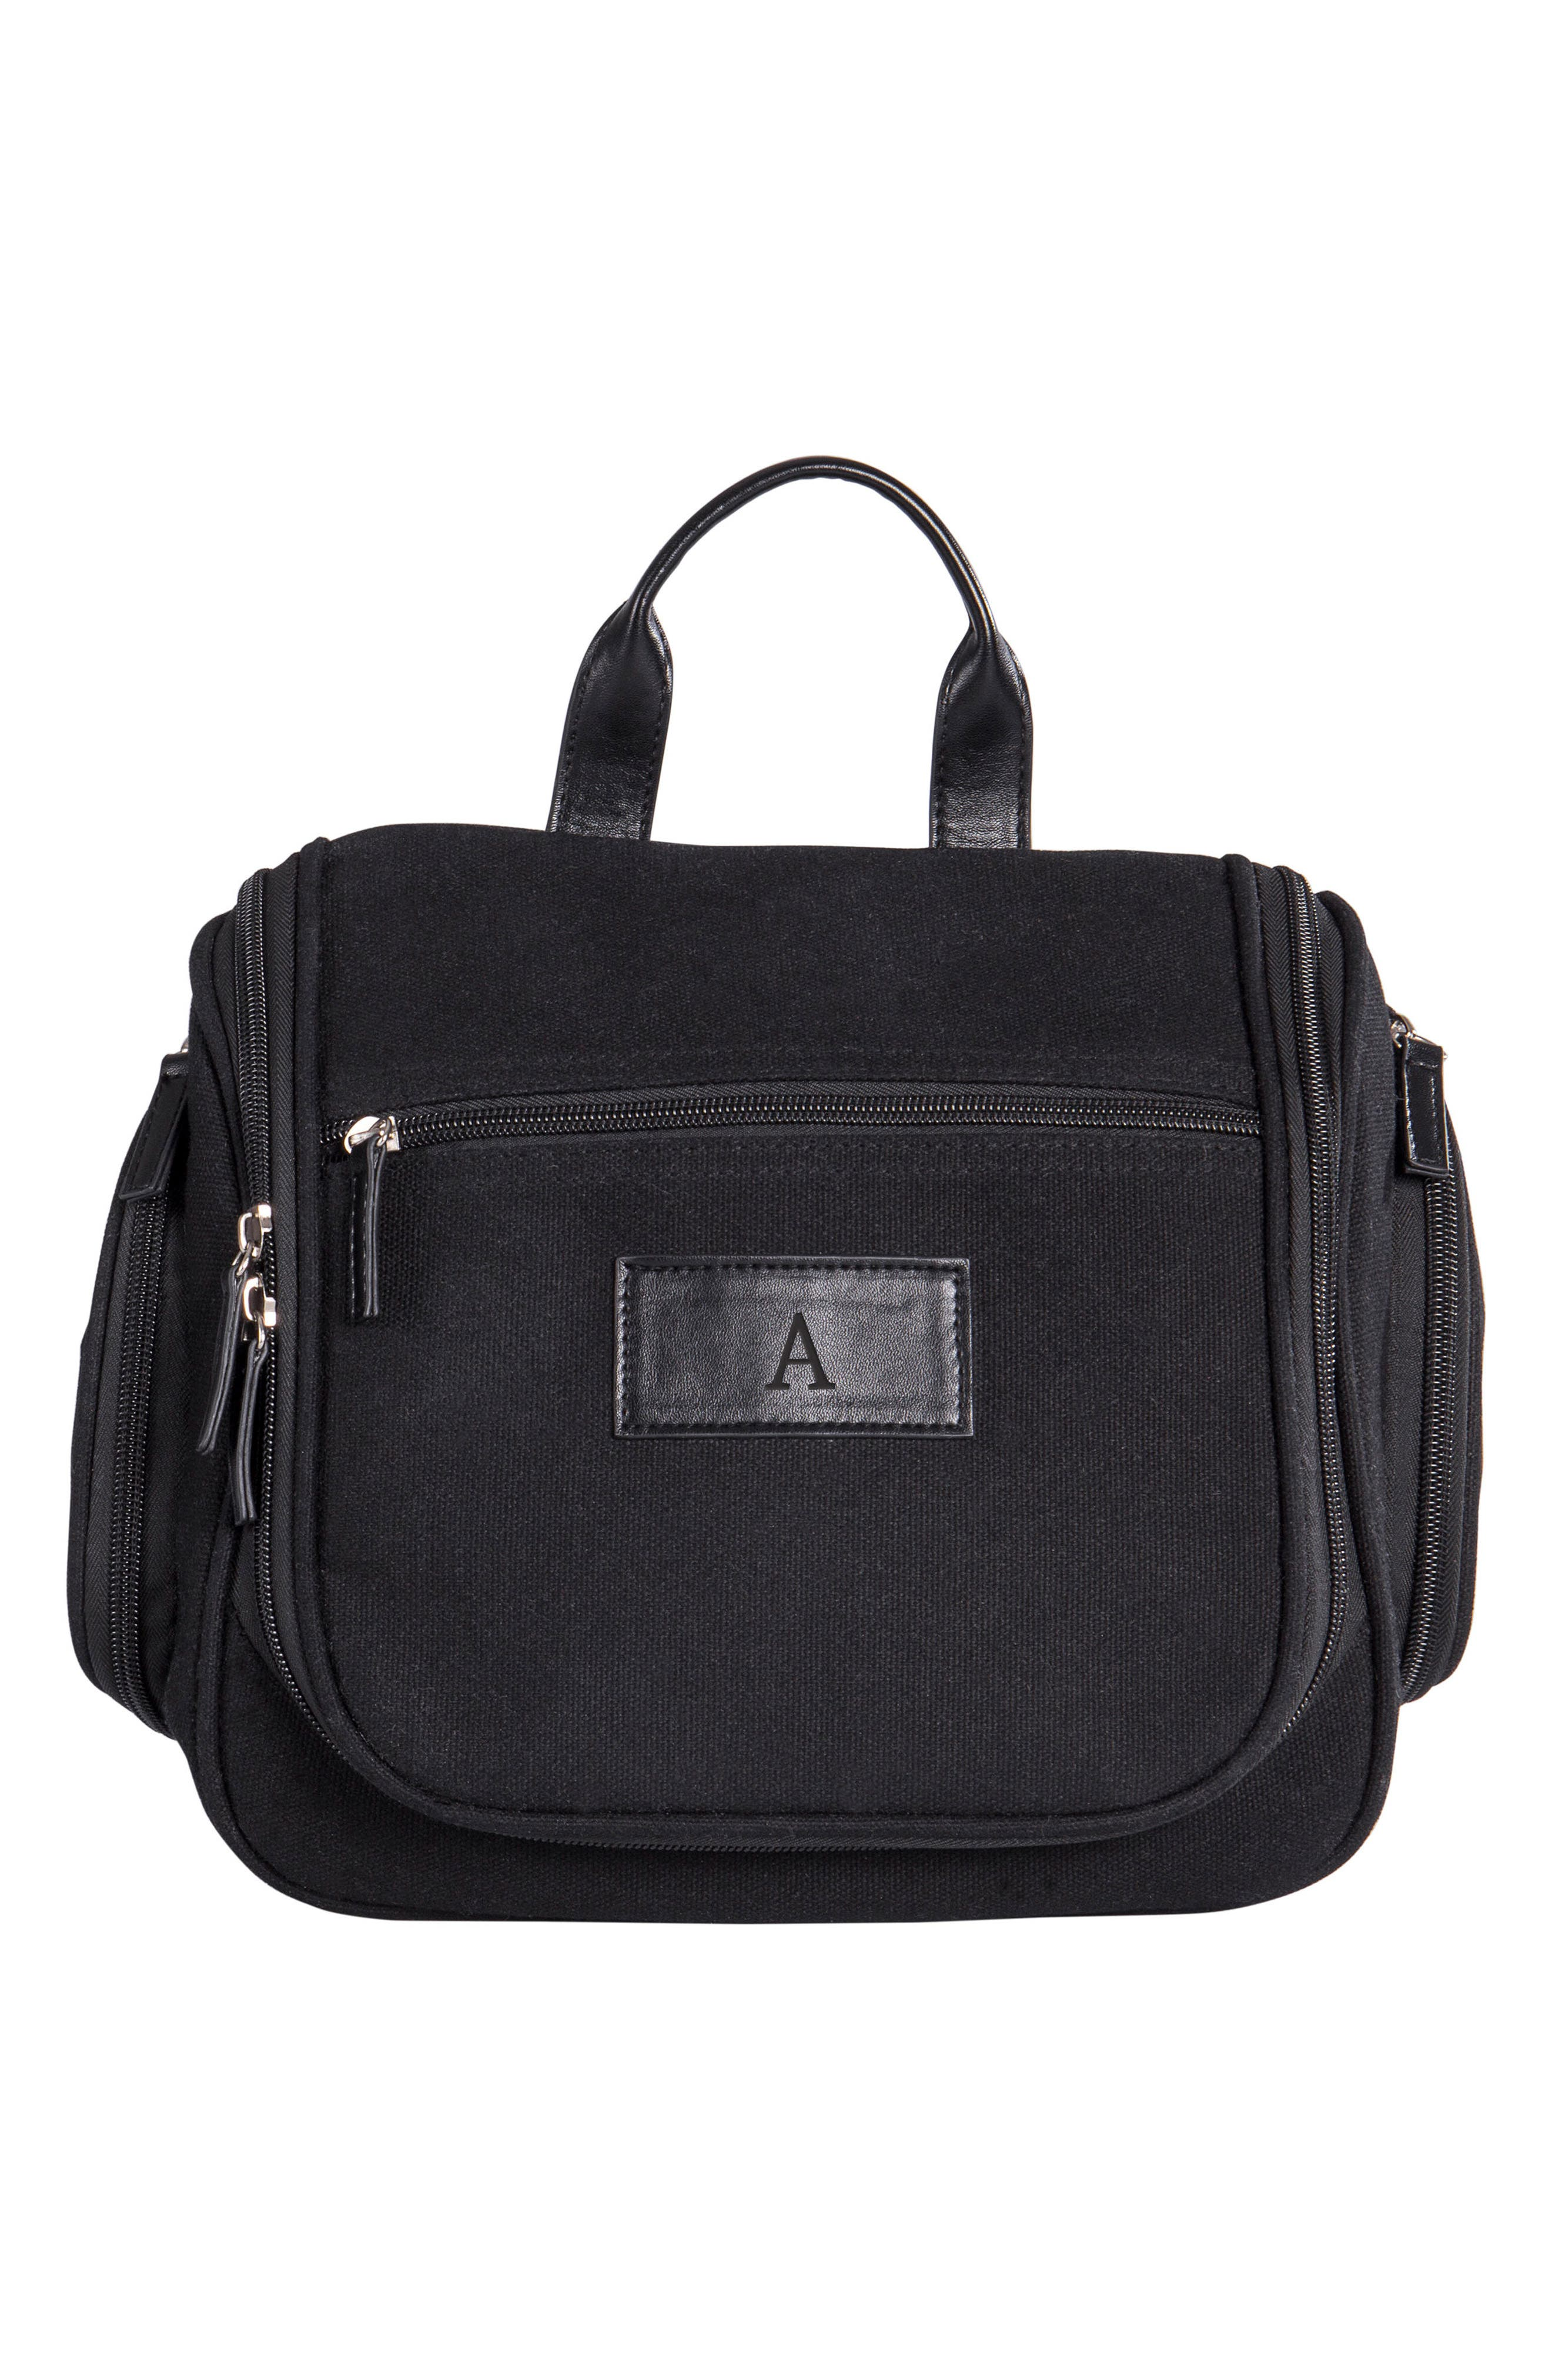 Monogram Toiletry Bag,                         Main,                         color, Black-A